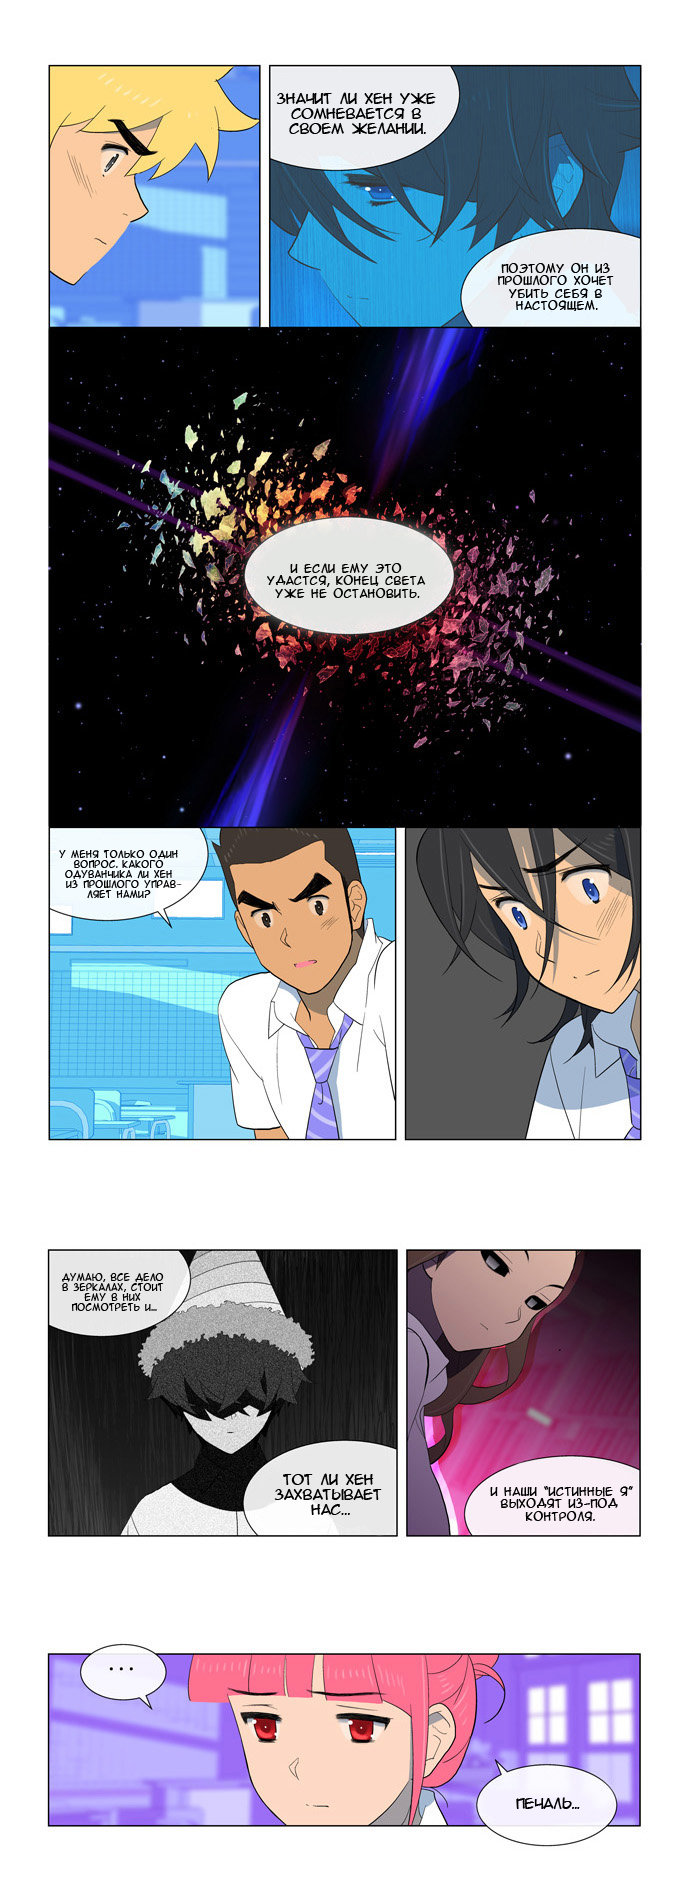 https://r1.ninemanga.com/comics/pic2/32/21344/207411/1427848153703.jpg Page 10